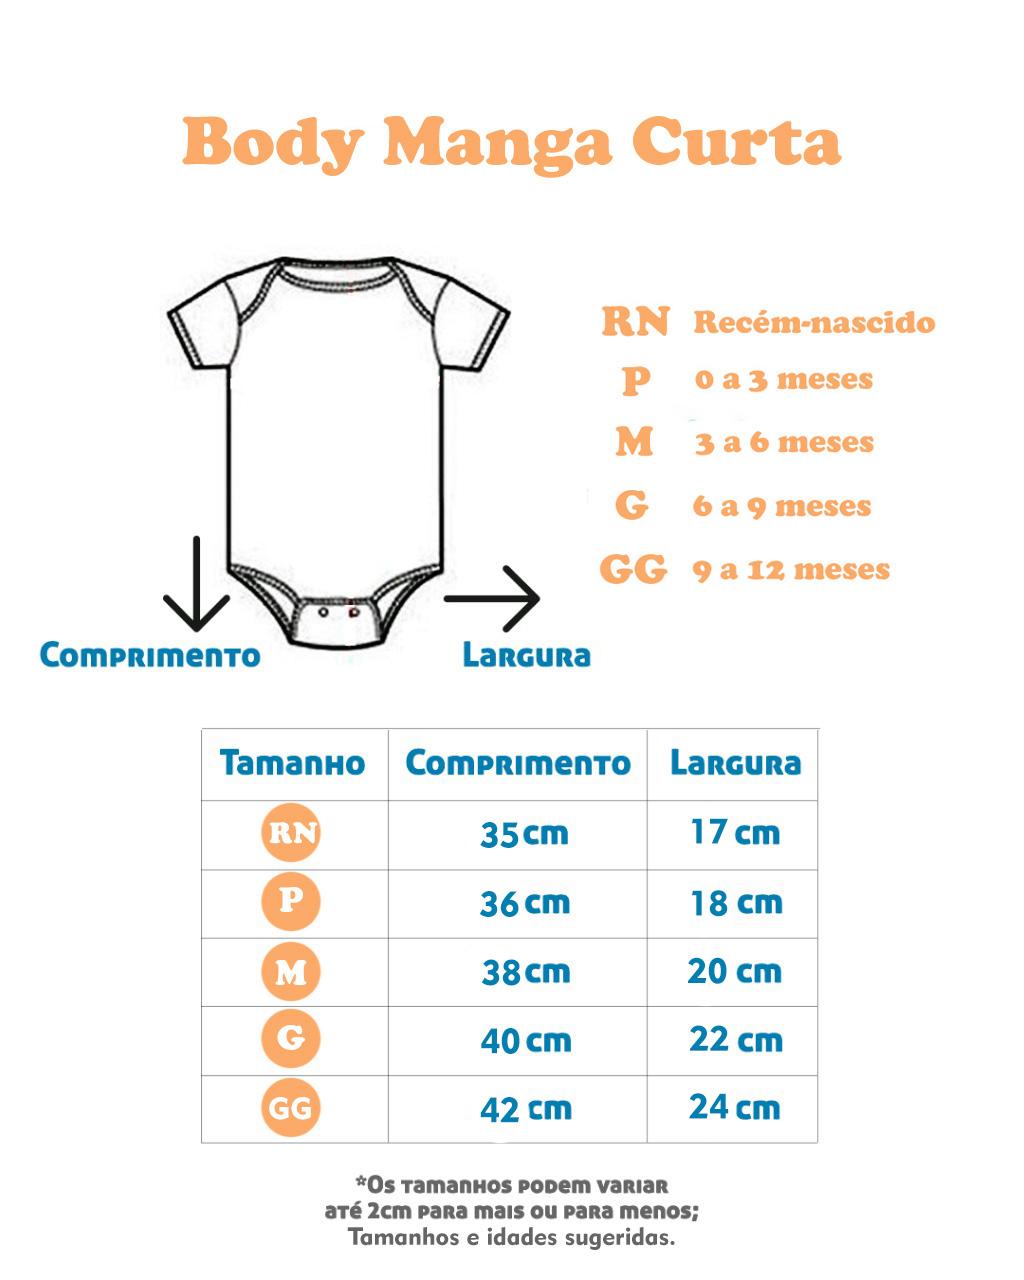 Body Manga Curta Rock'n Roll (P/M/G)